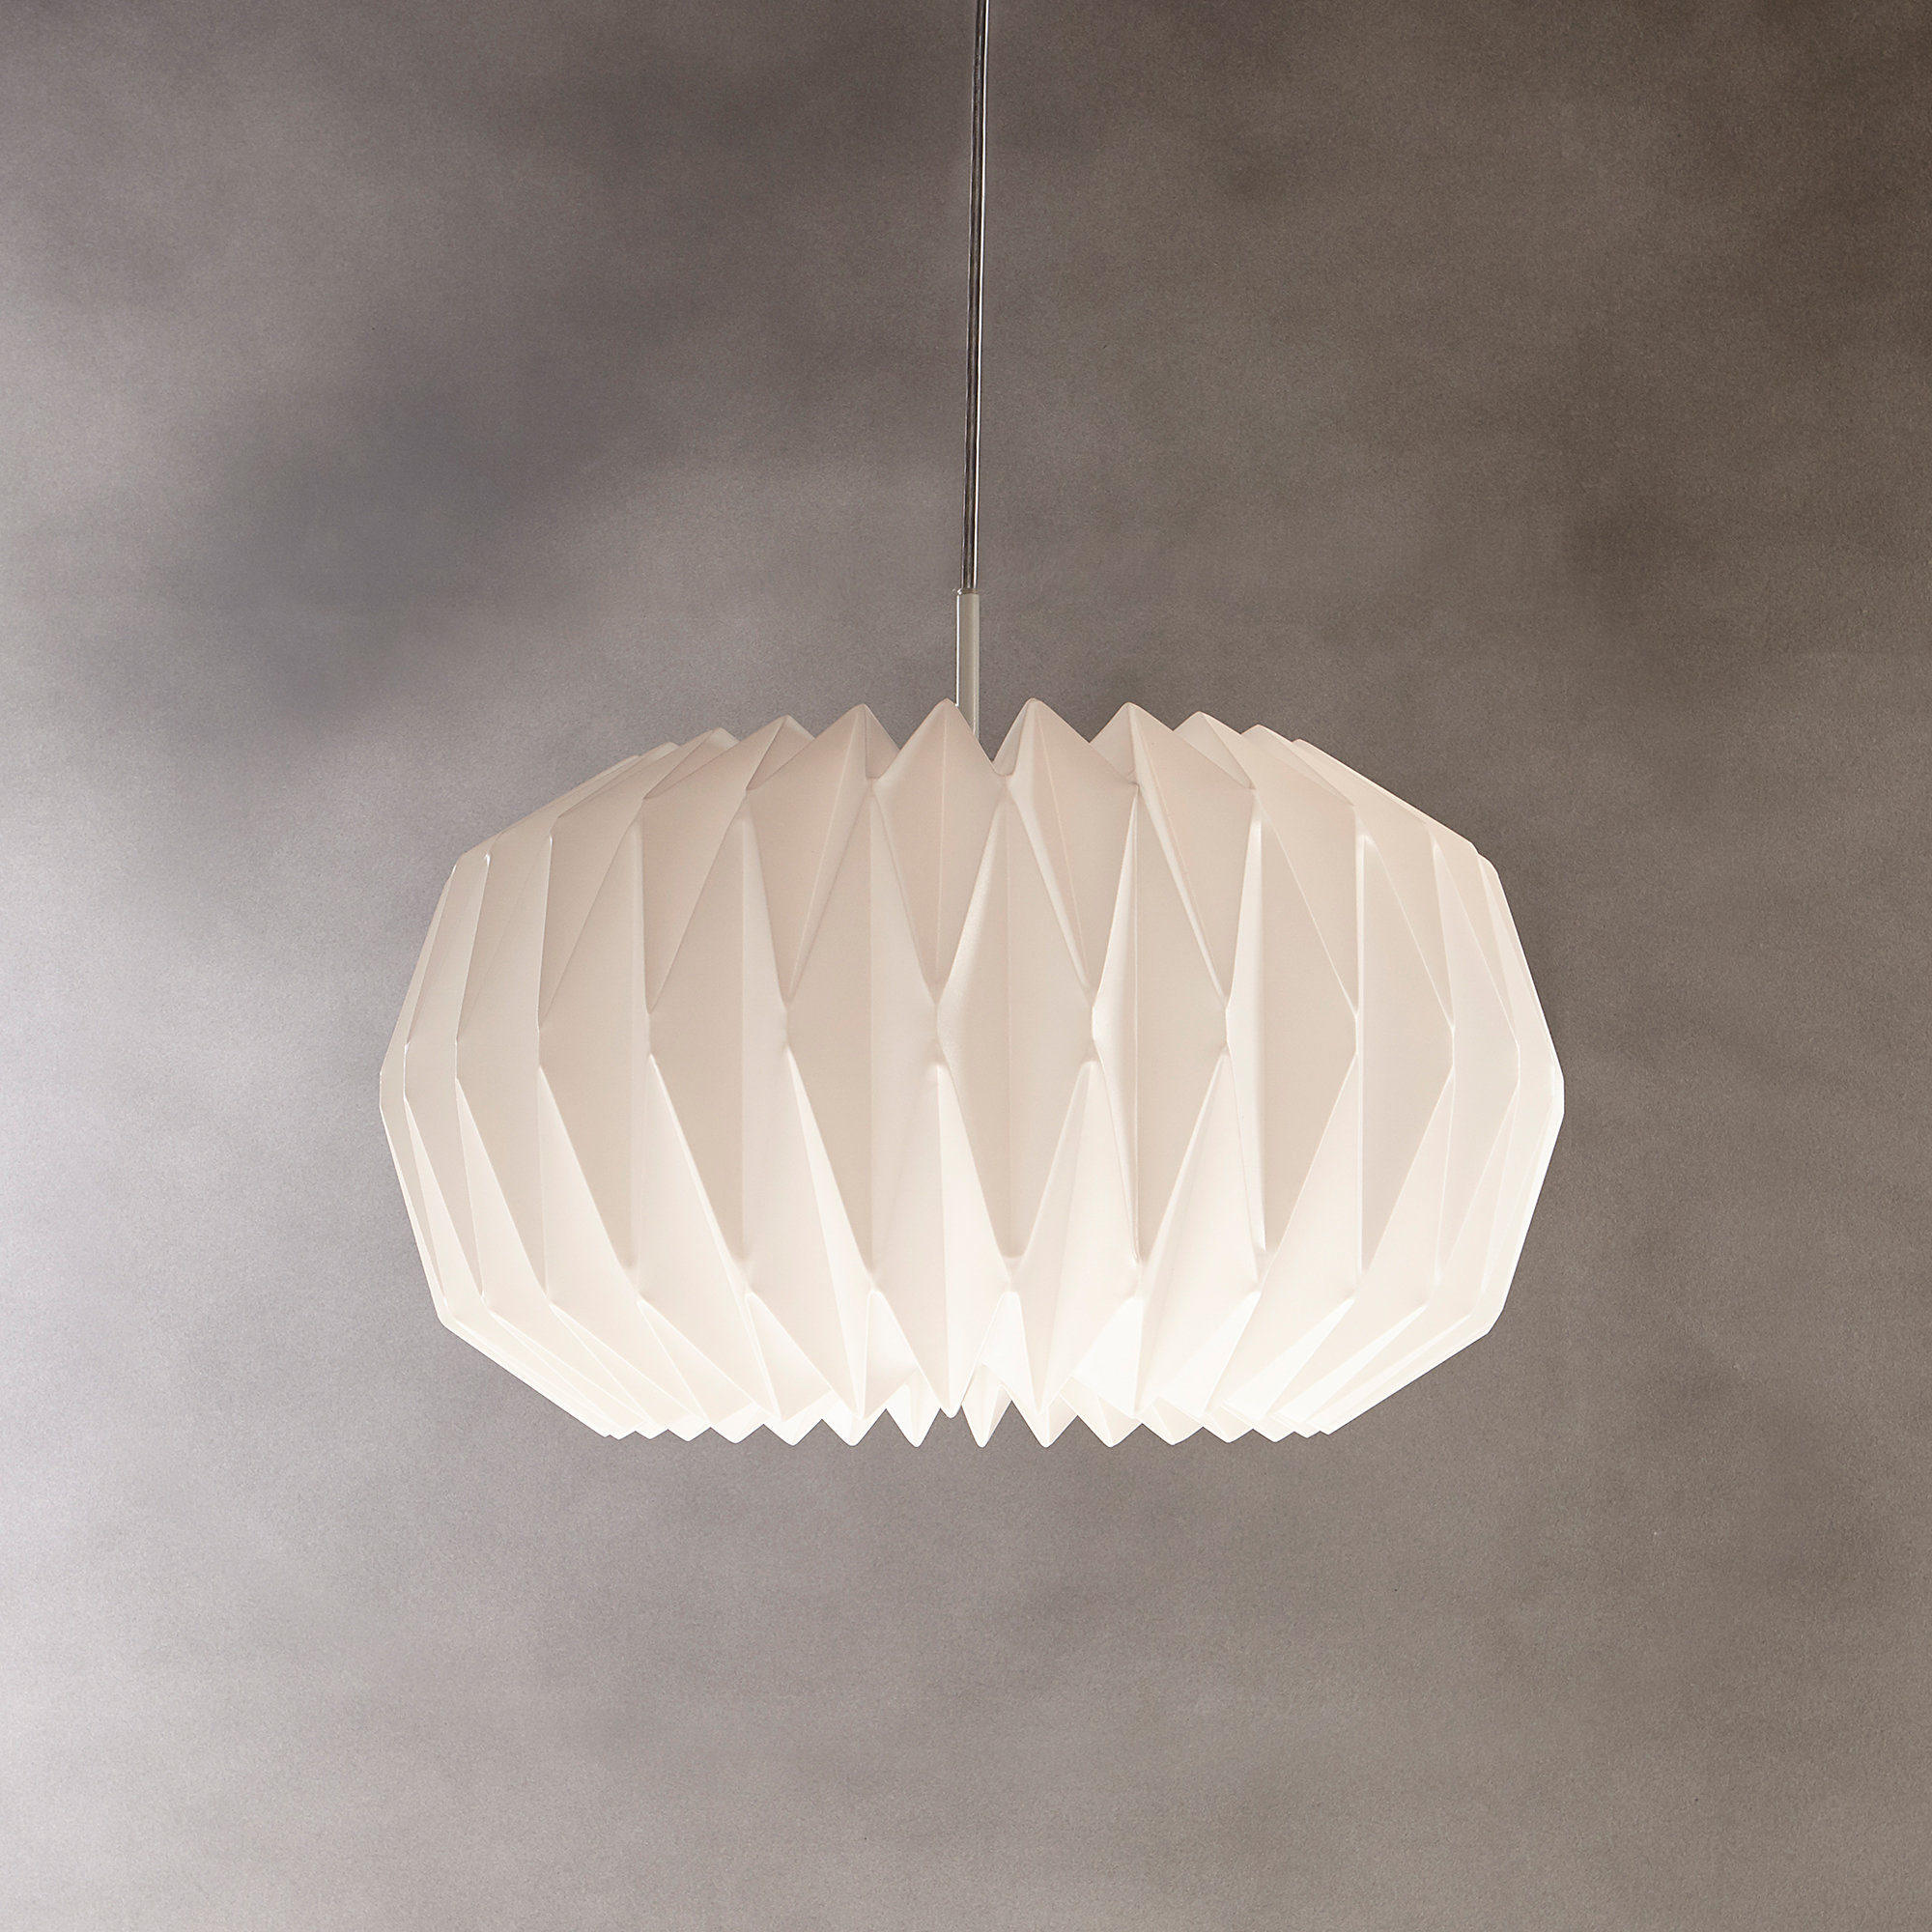 Gary Drum Pendant Throughout Latest Melora 1 Light Single Geometric Pendants (Gallery 14 of 20)